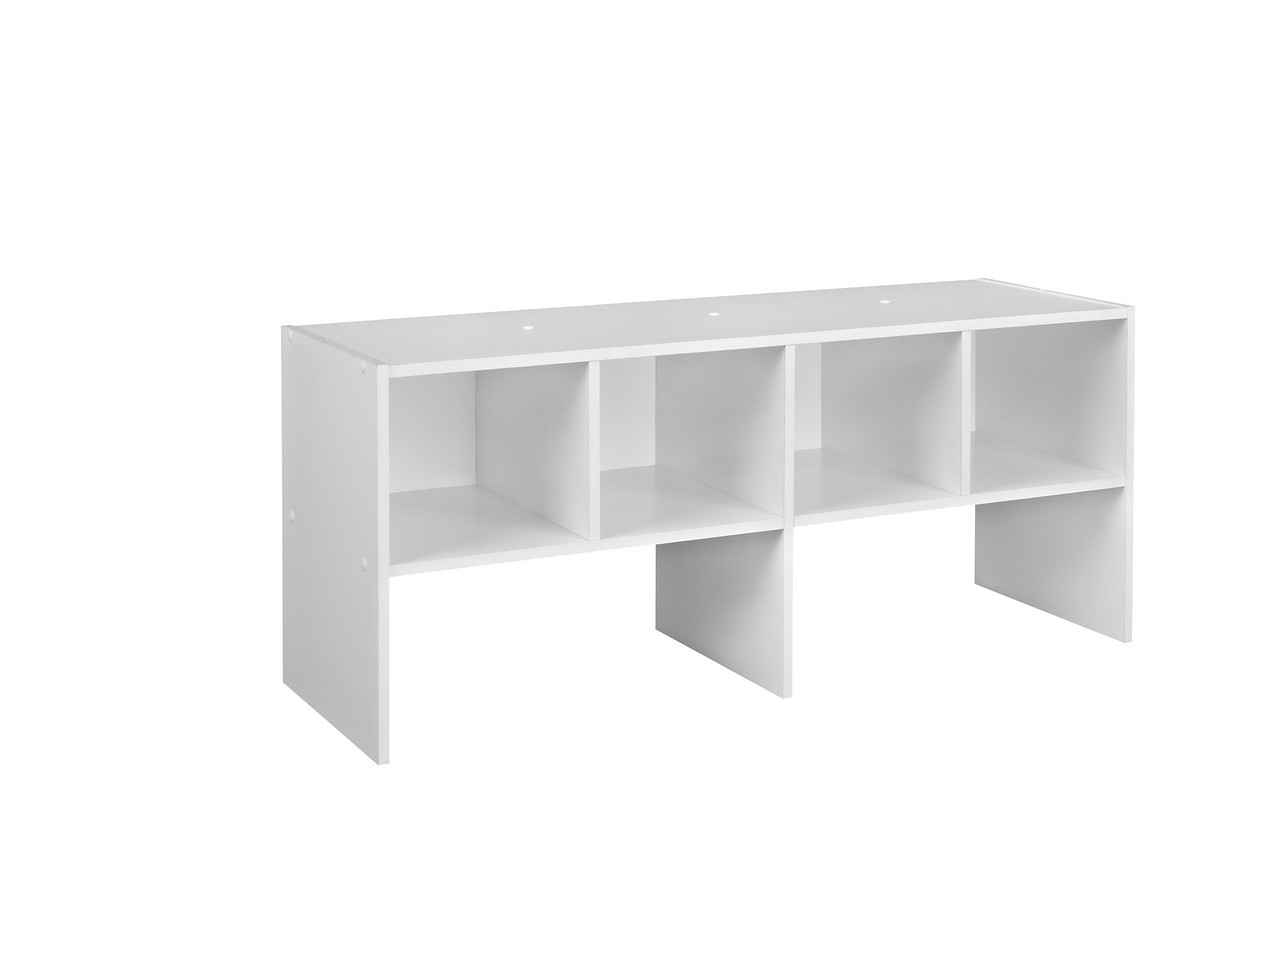 ClosetMaid Shelf Organizer in White